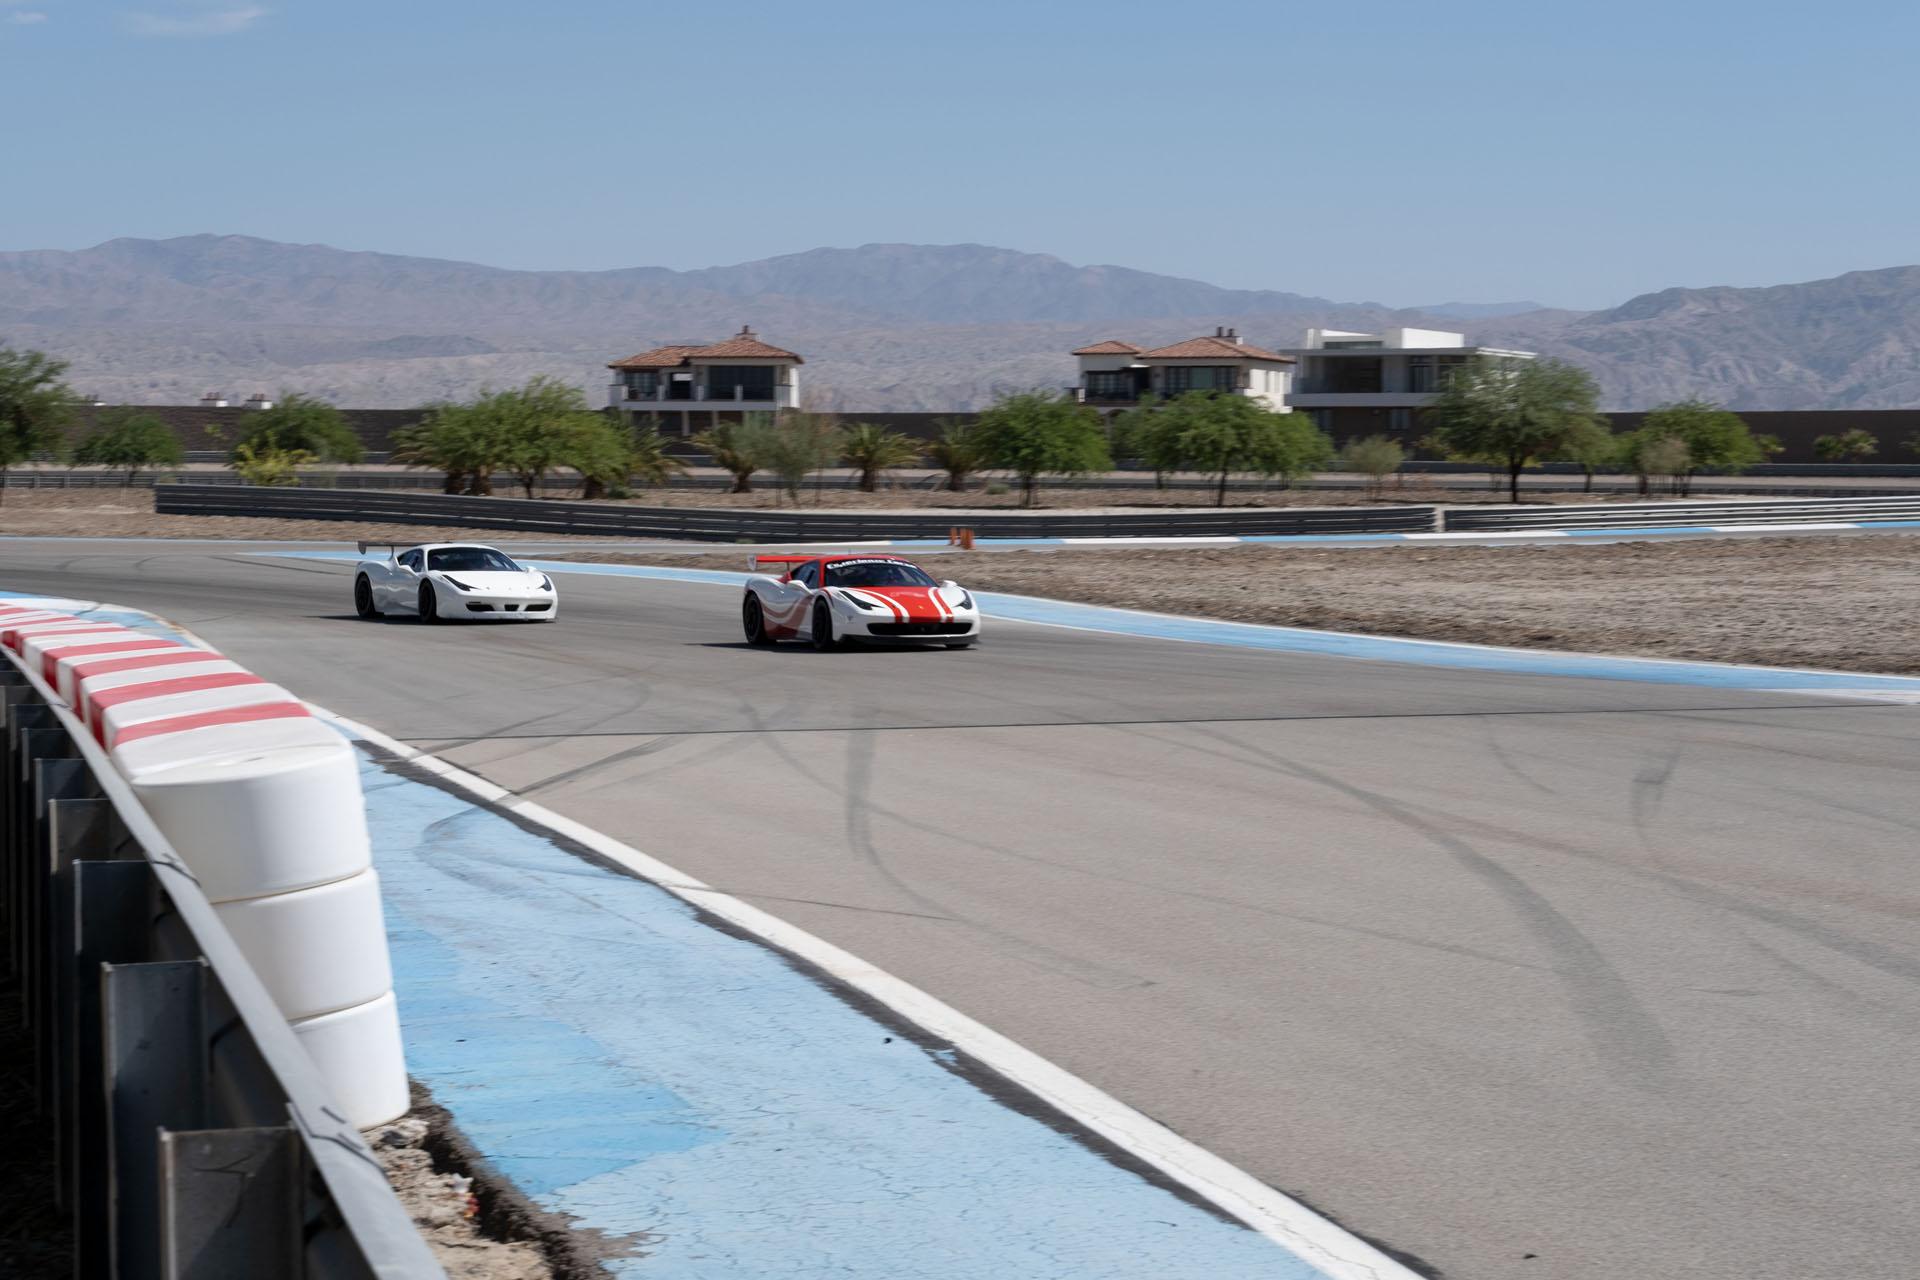 2 Ferraris On Track